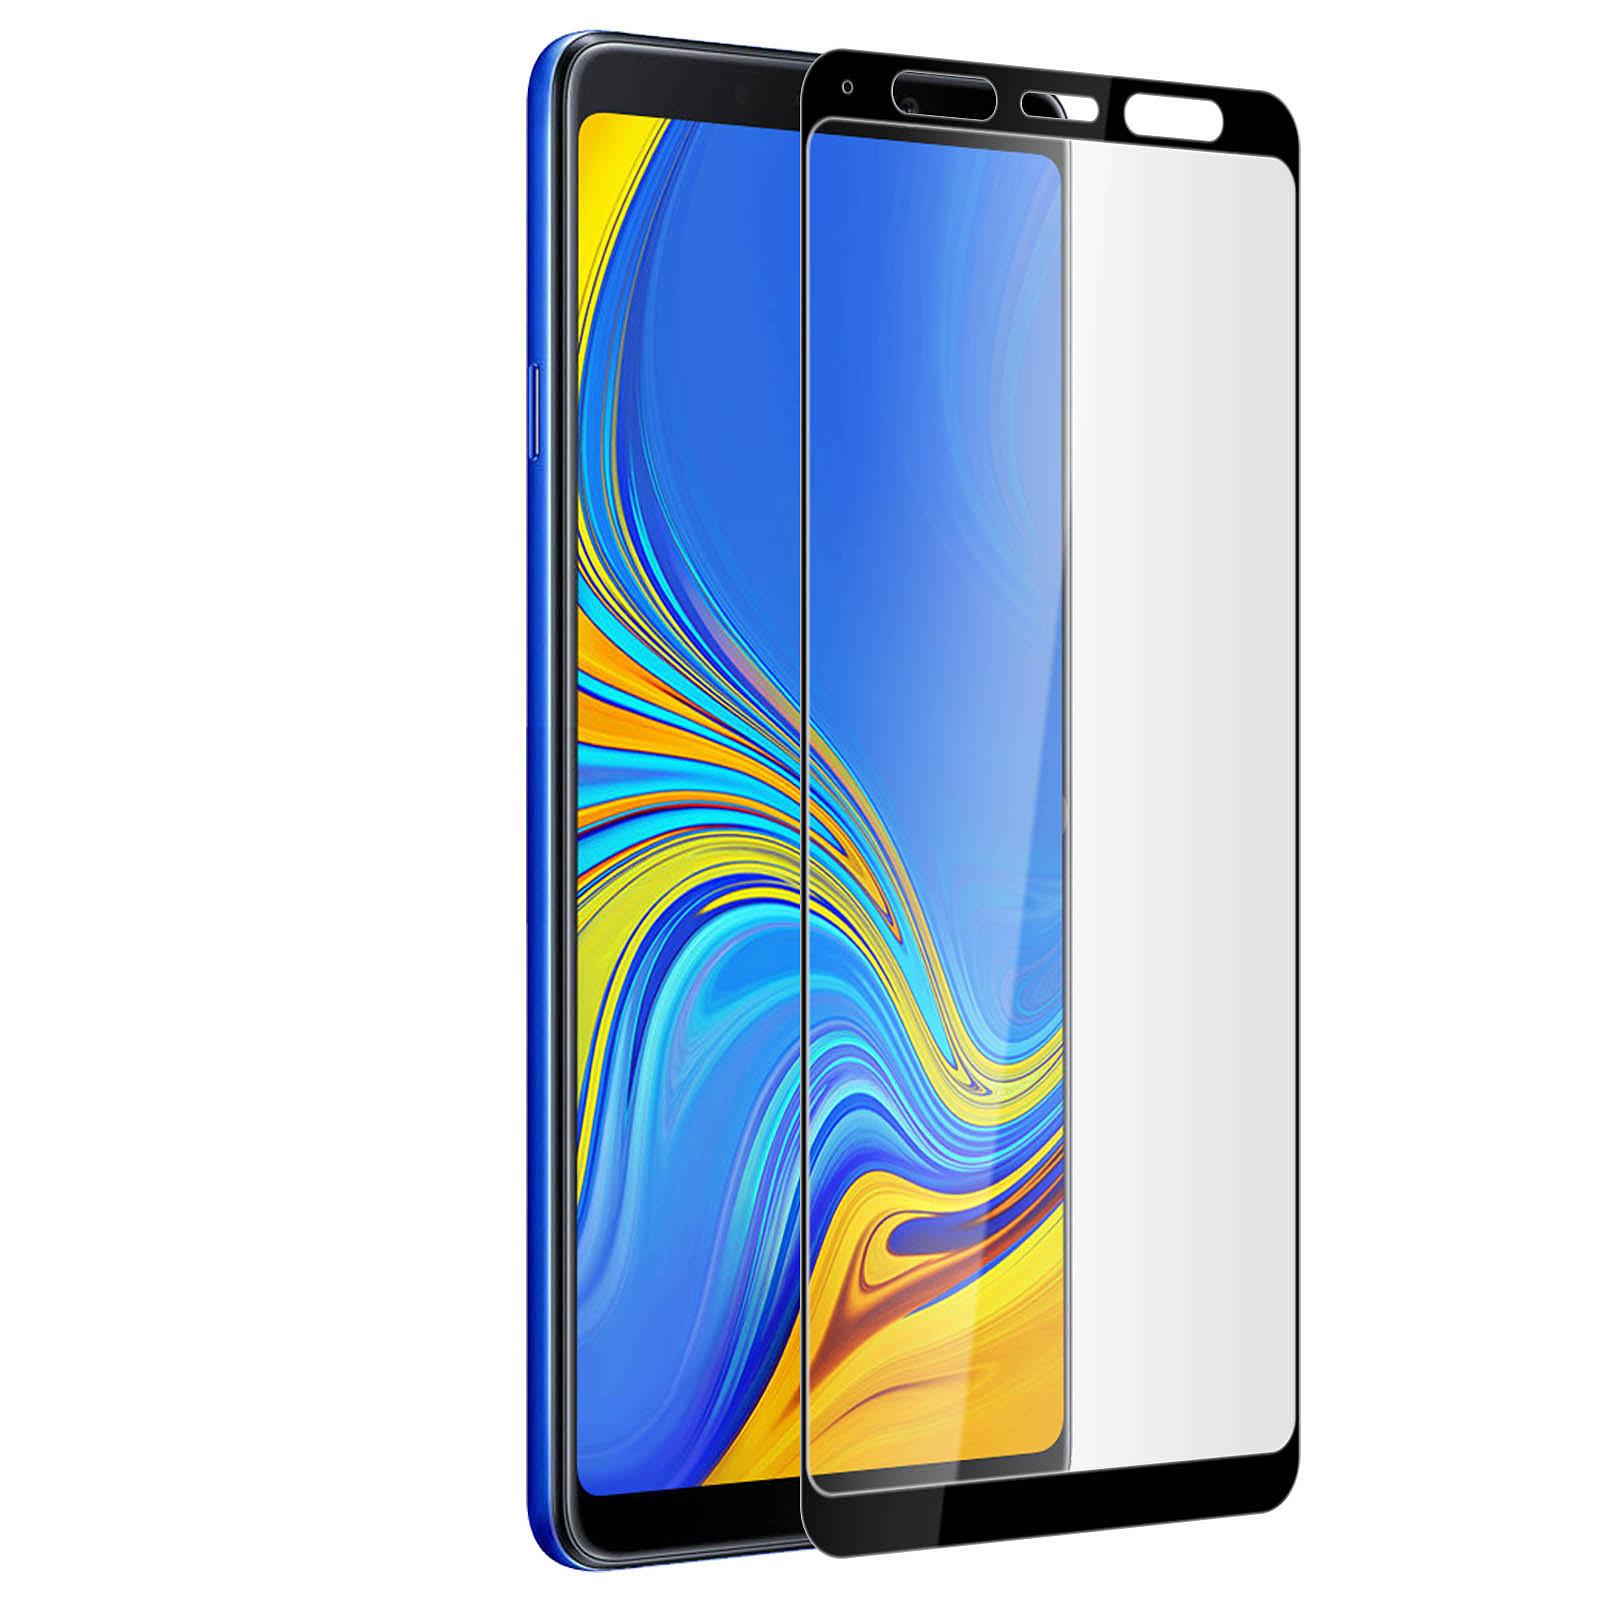 Avizar Film verre trempé Noir pour Samsung Galaxy A9 2018